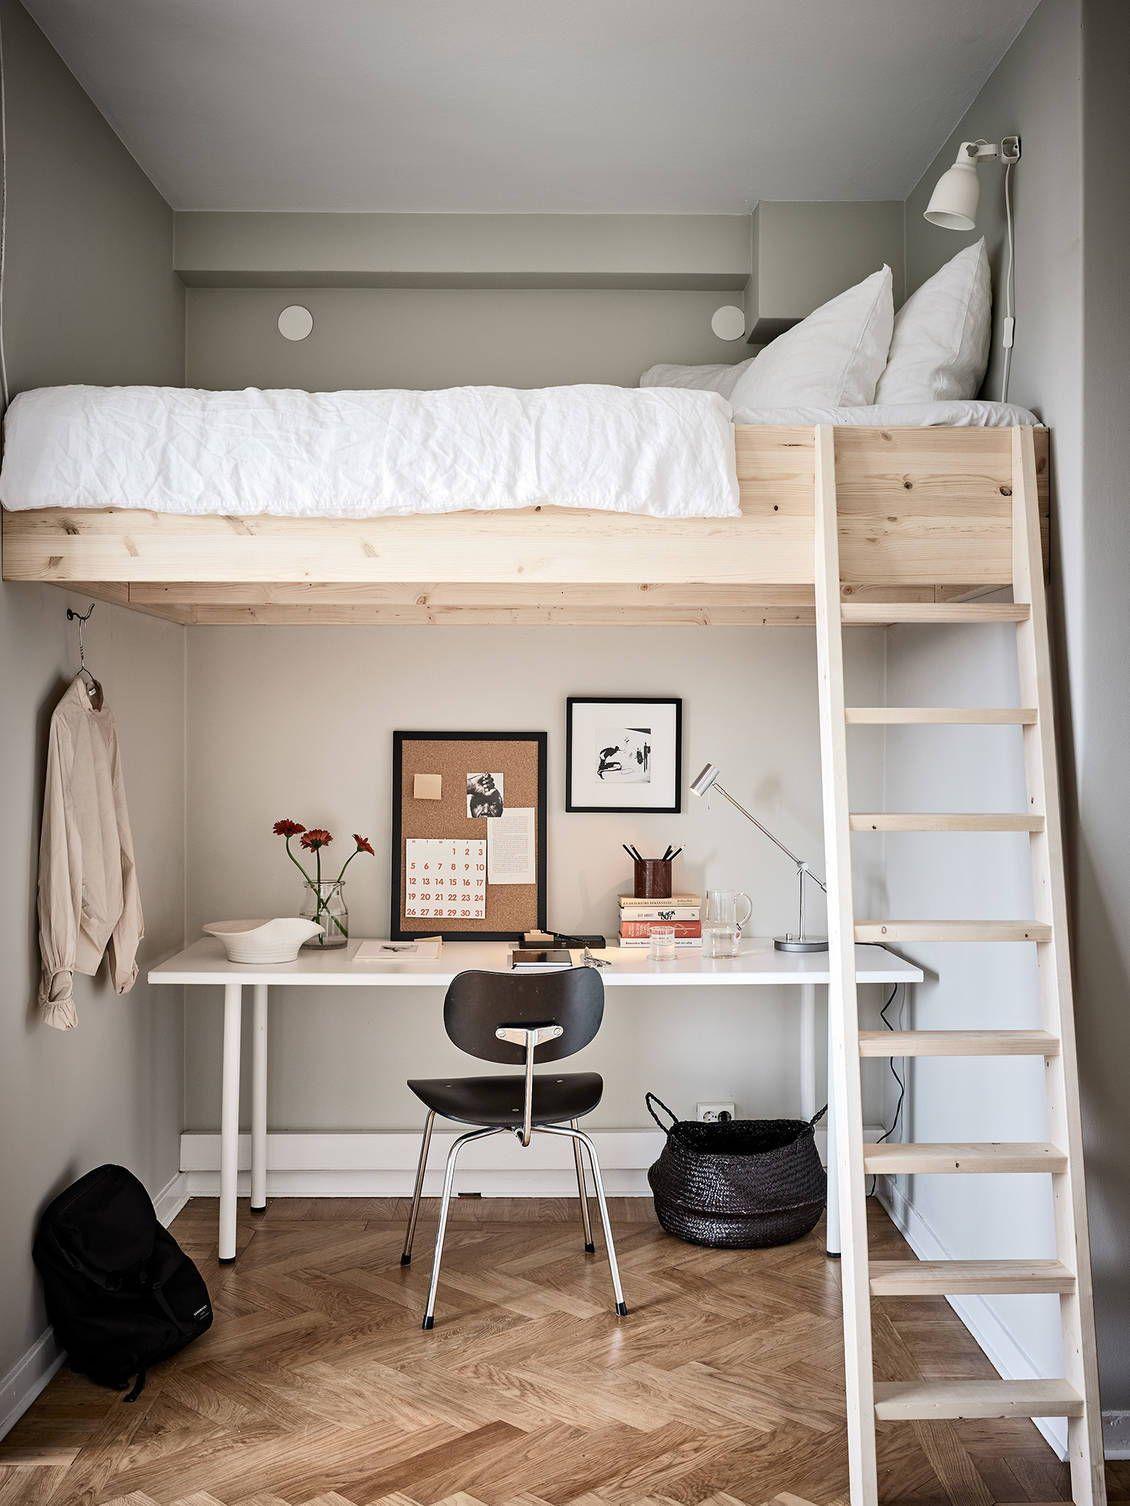 Cozy Duplex Studio Home Coco Lapine Design Room Design Bedroom Loft Beds For Small Rooms Small Room Design Bedroom Aesthetic loft bedroom ideas